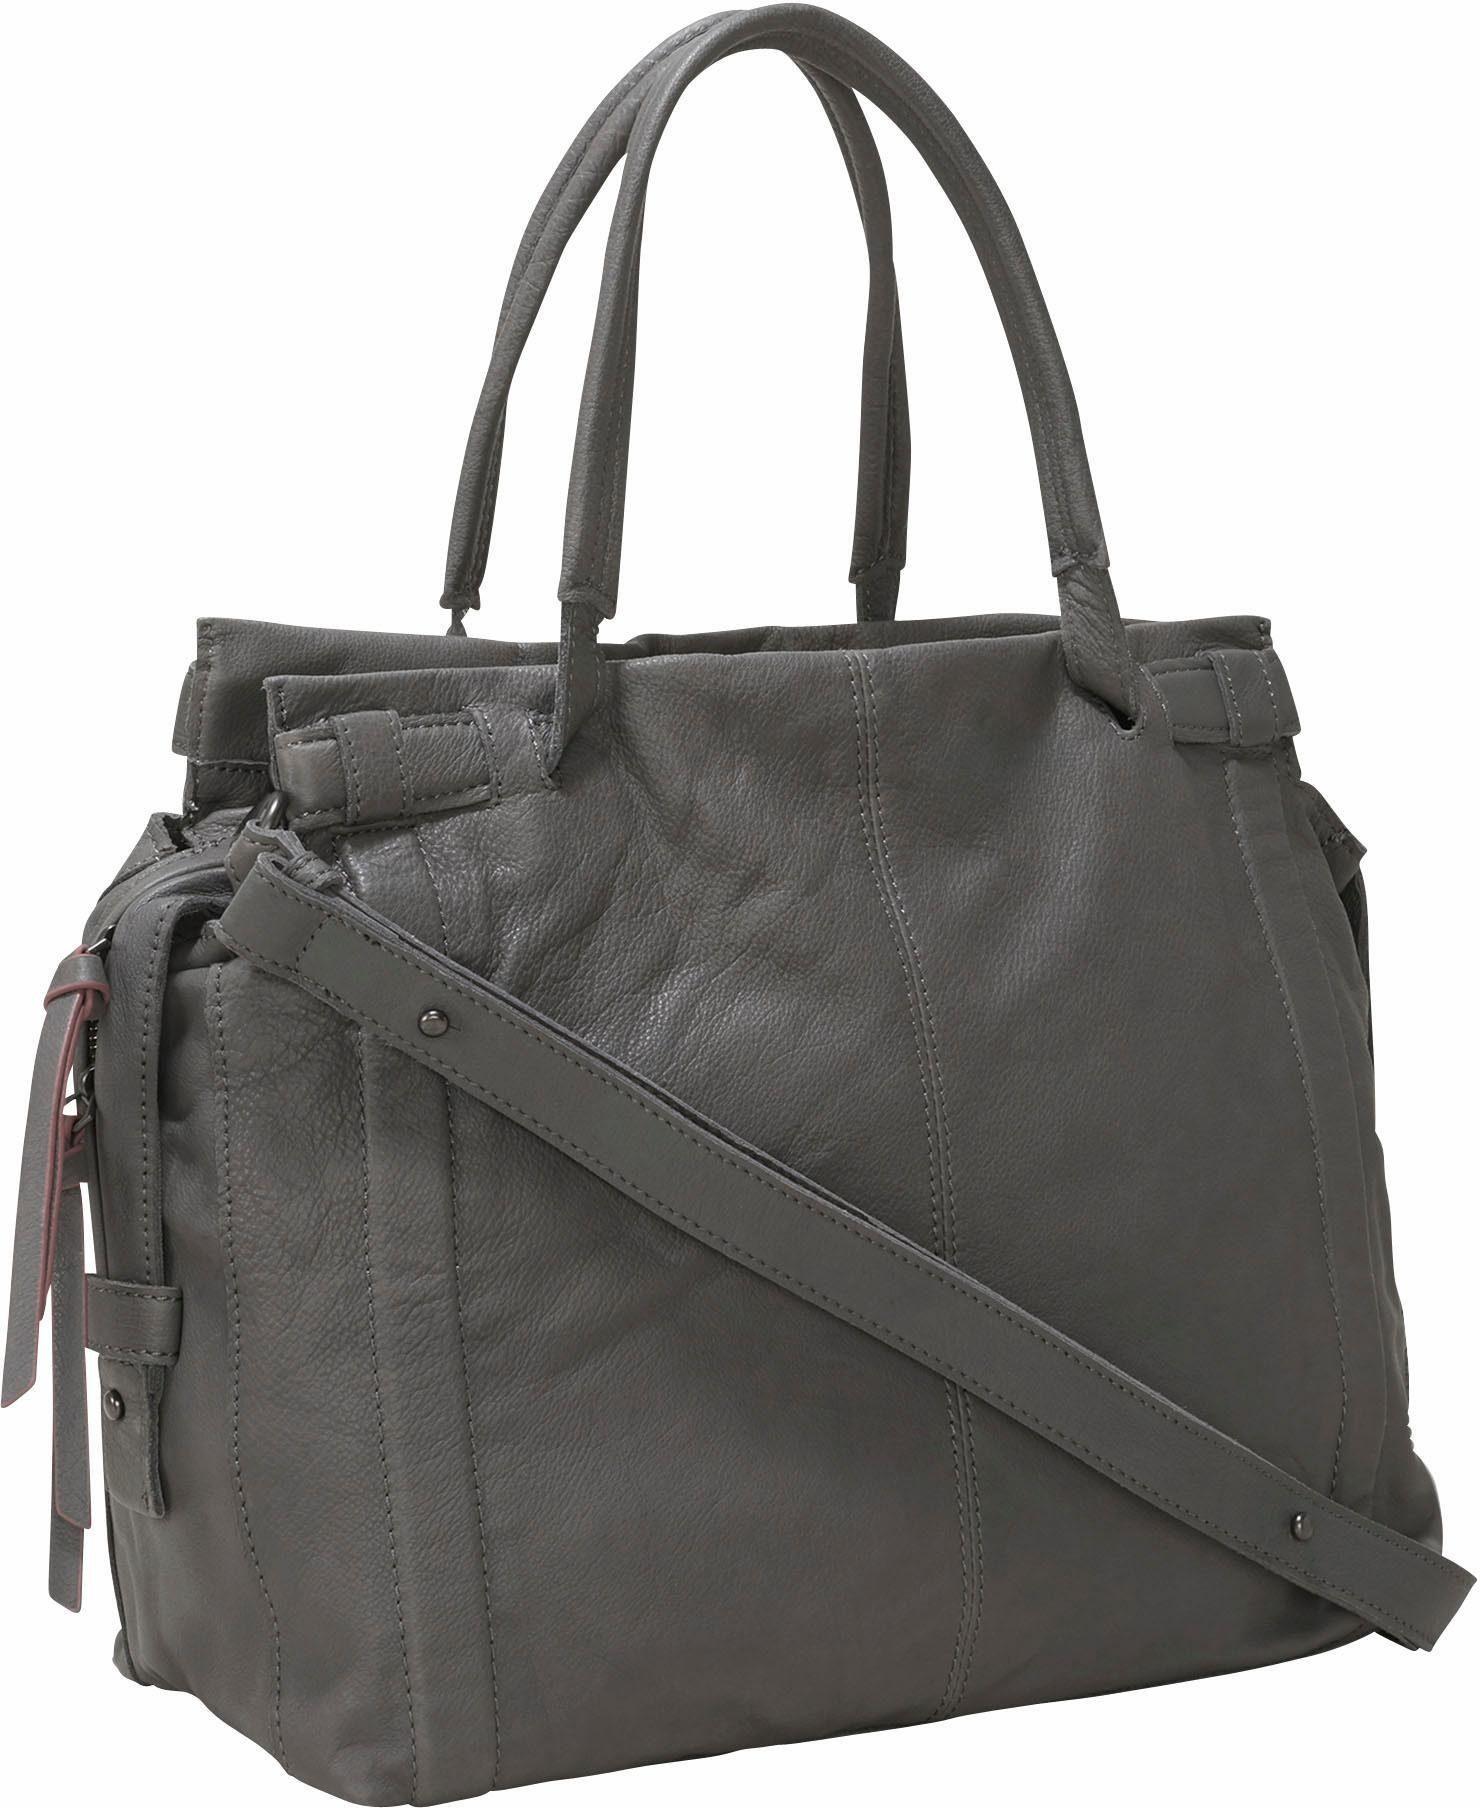 TASCHEN - Handtaschen Virginia's Street VuwfOz